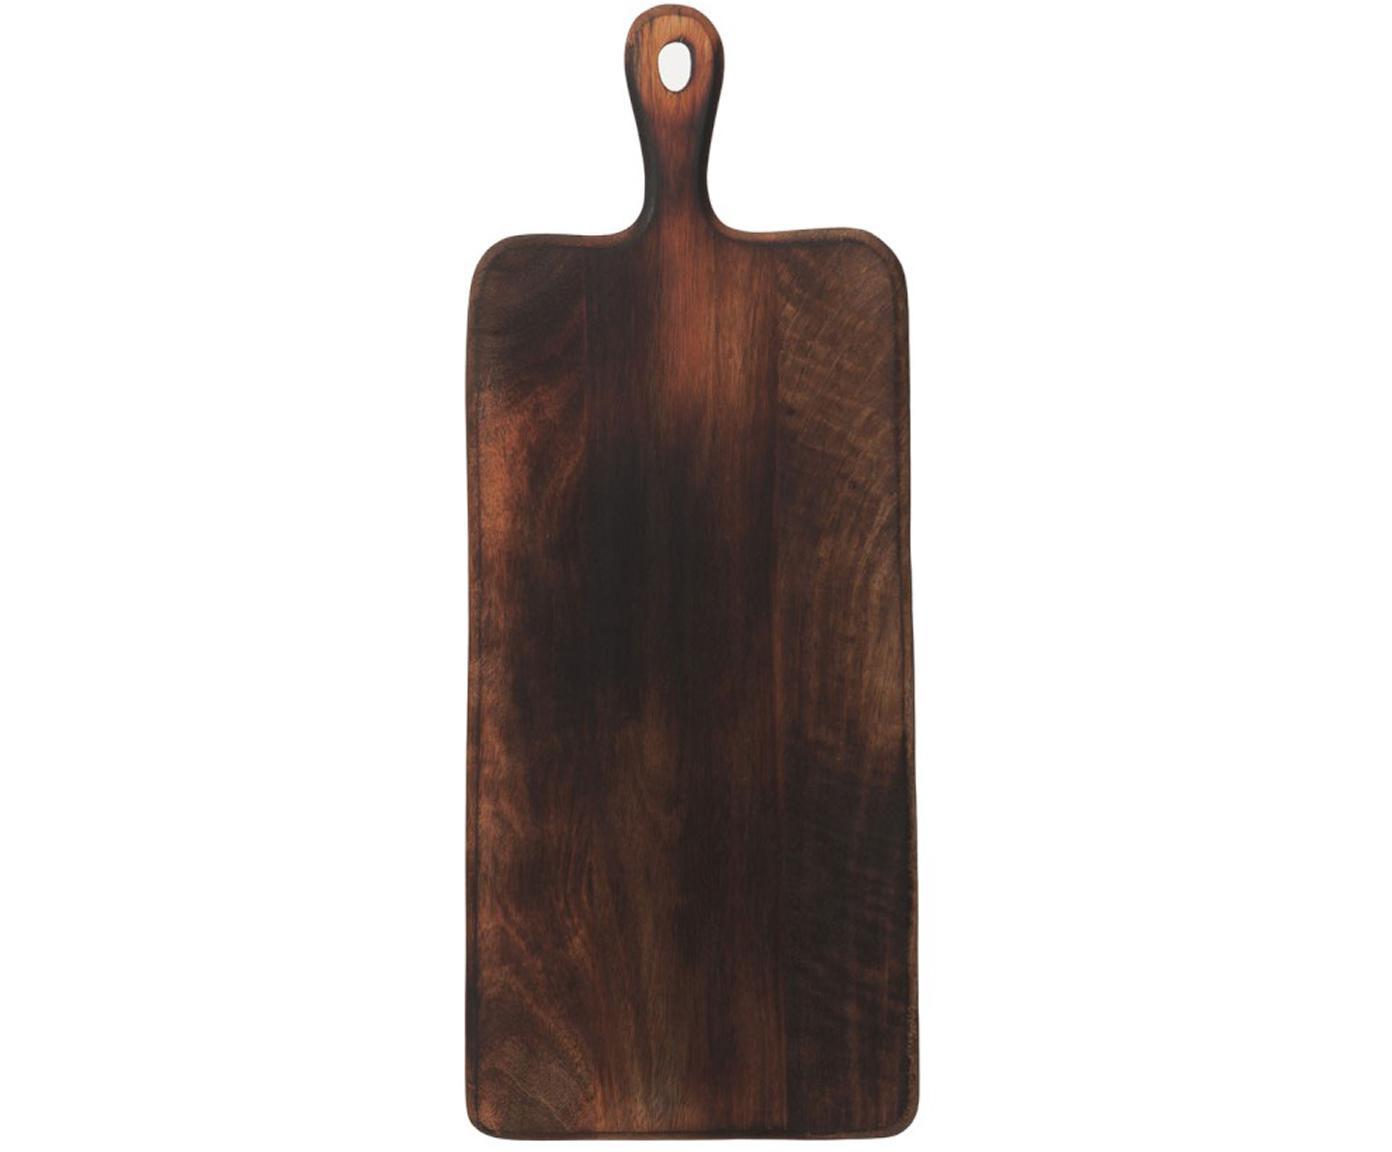 Tabla de cortar Branek, Madera, Marrón oscuro, An 50 x Al 1 cm